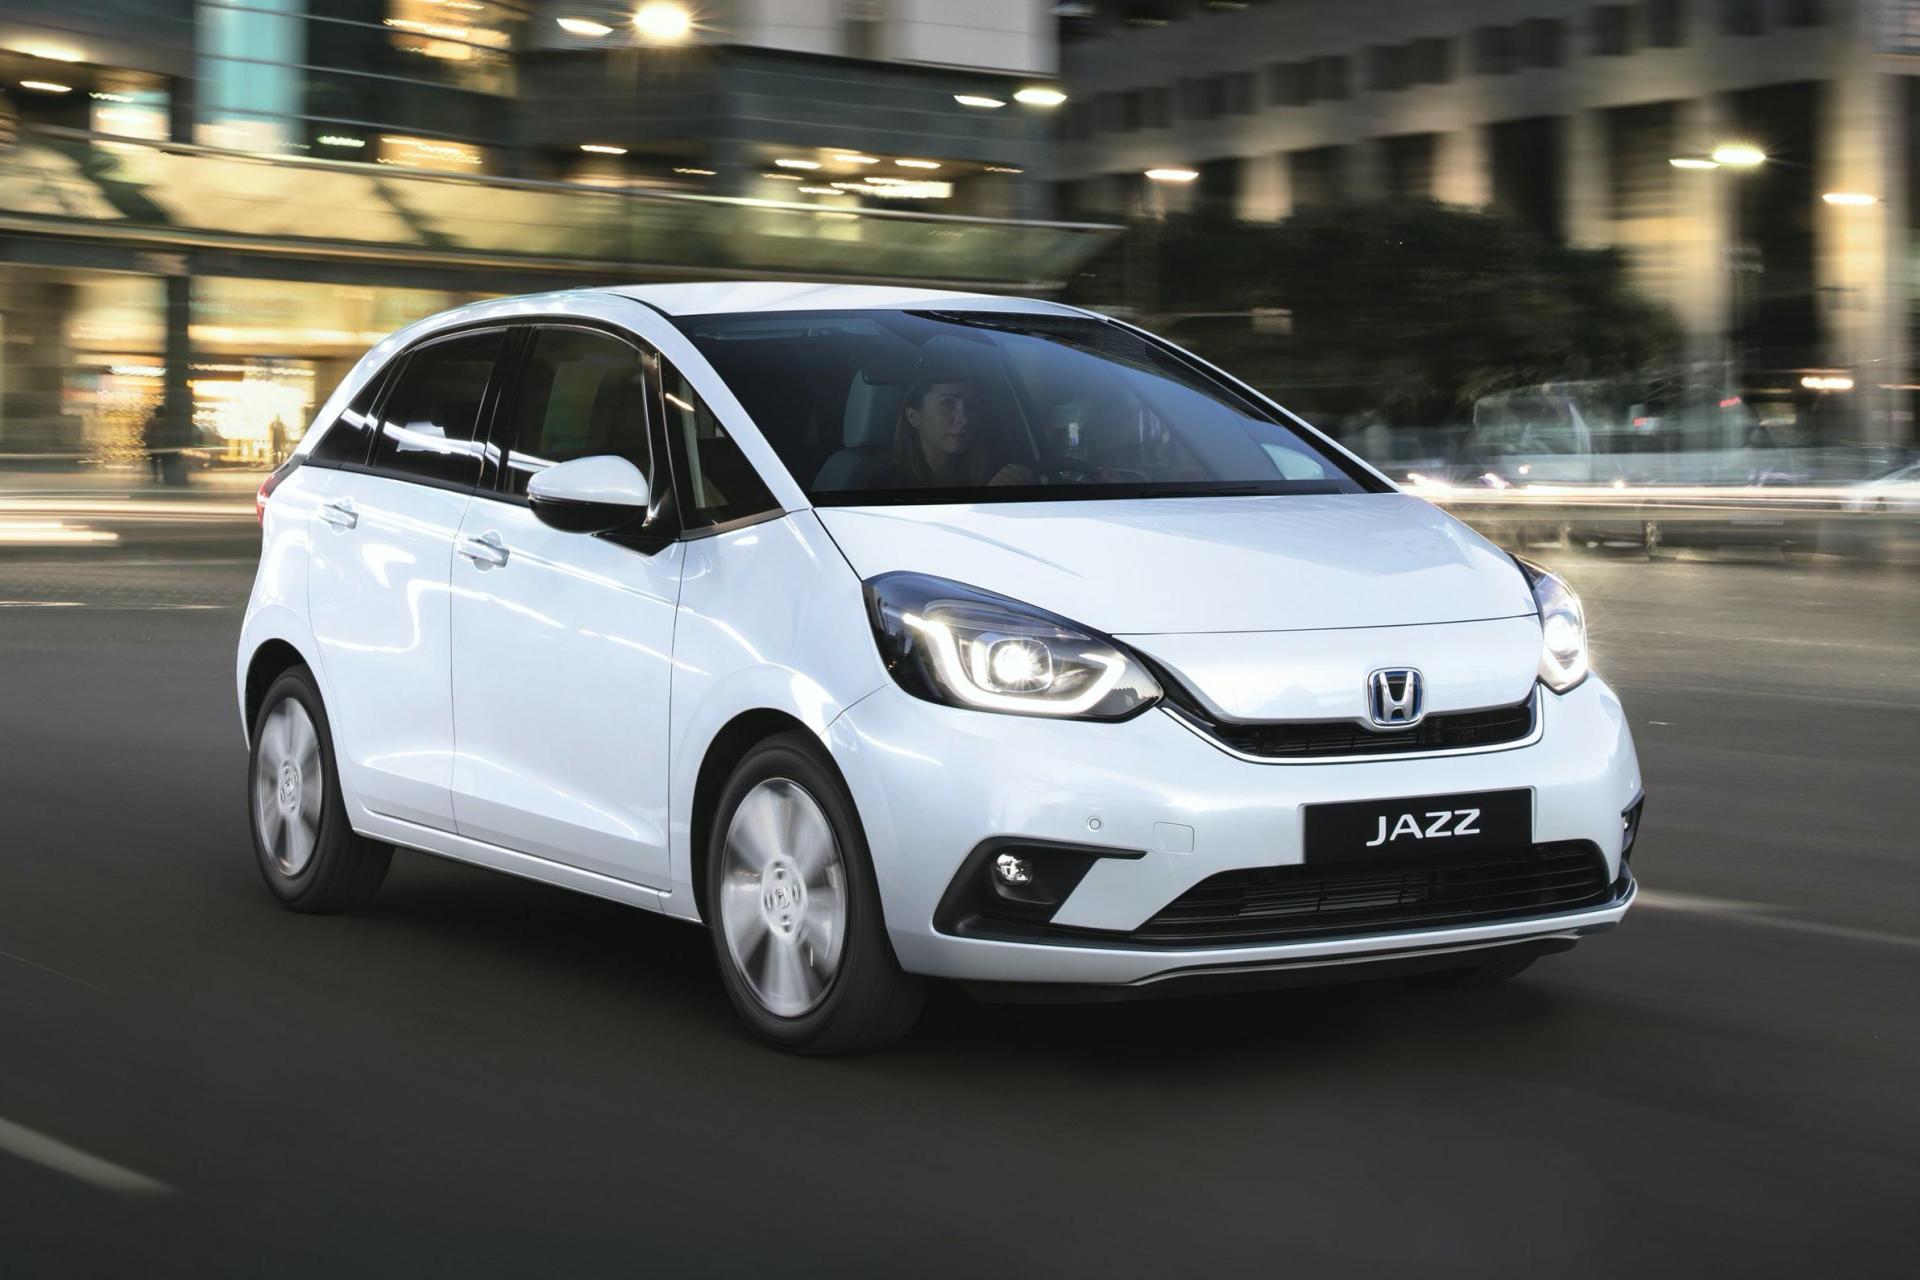 2020-Honda-Jazz-Euro-spec-52